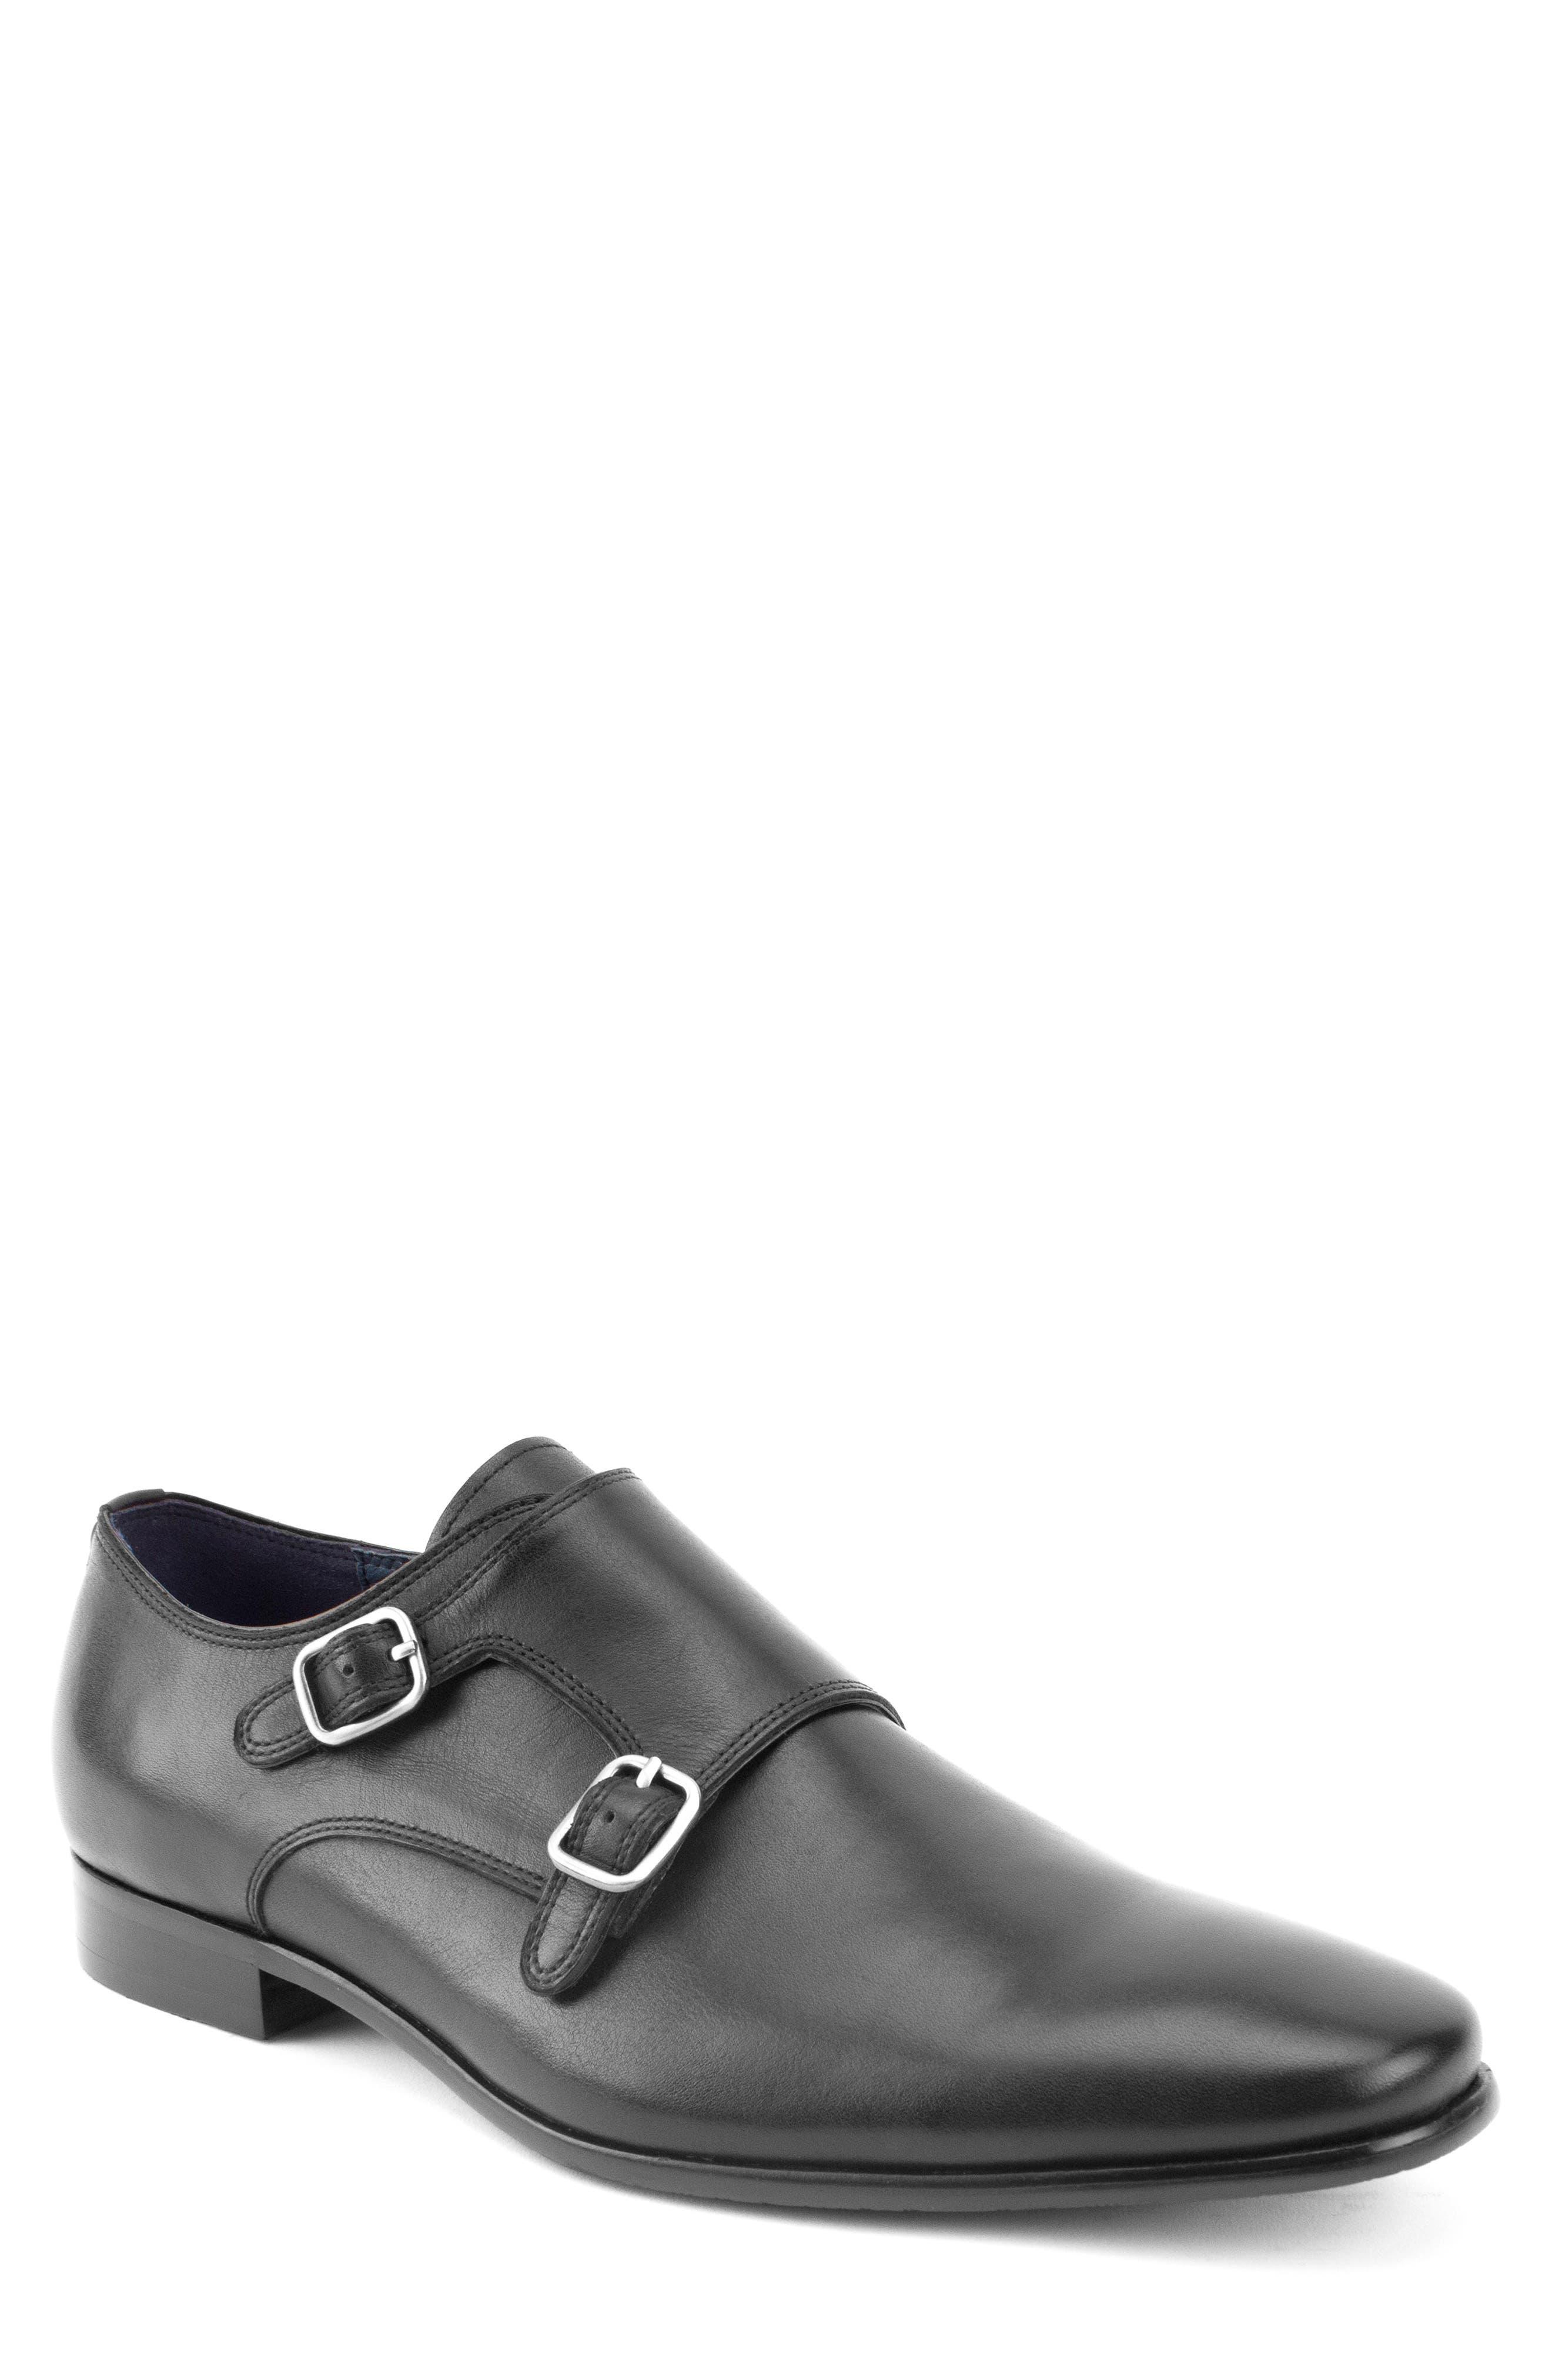 Luke Double Buckle Monk Shoe,                         Main,                         color, BLACK LEATHER